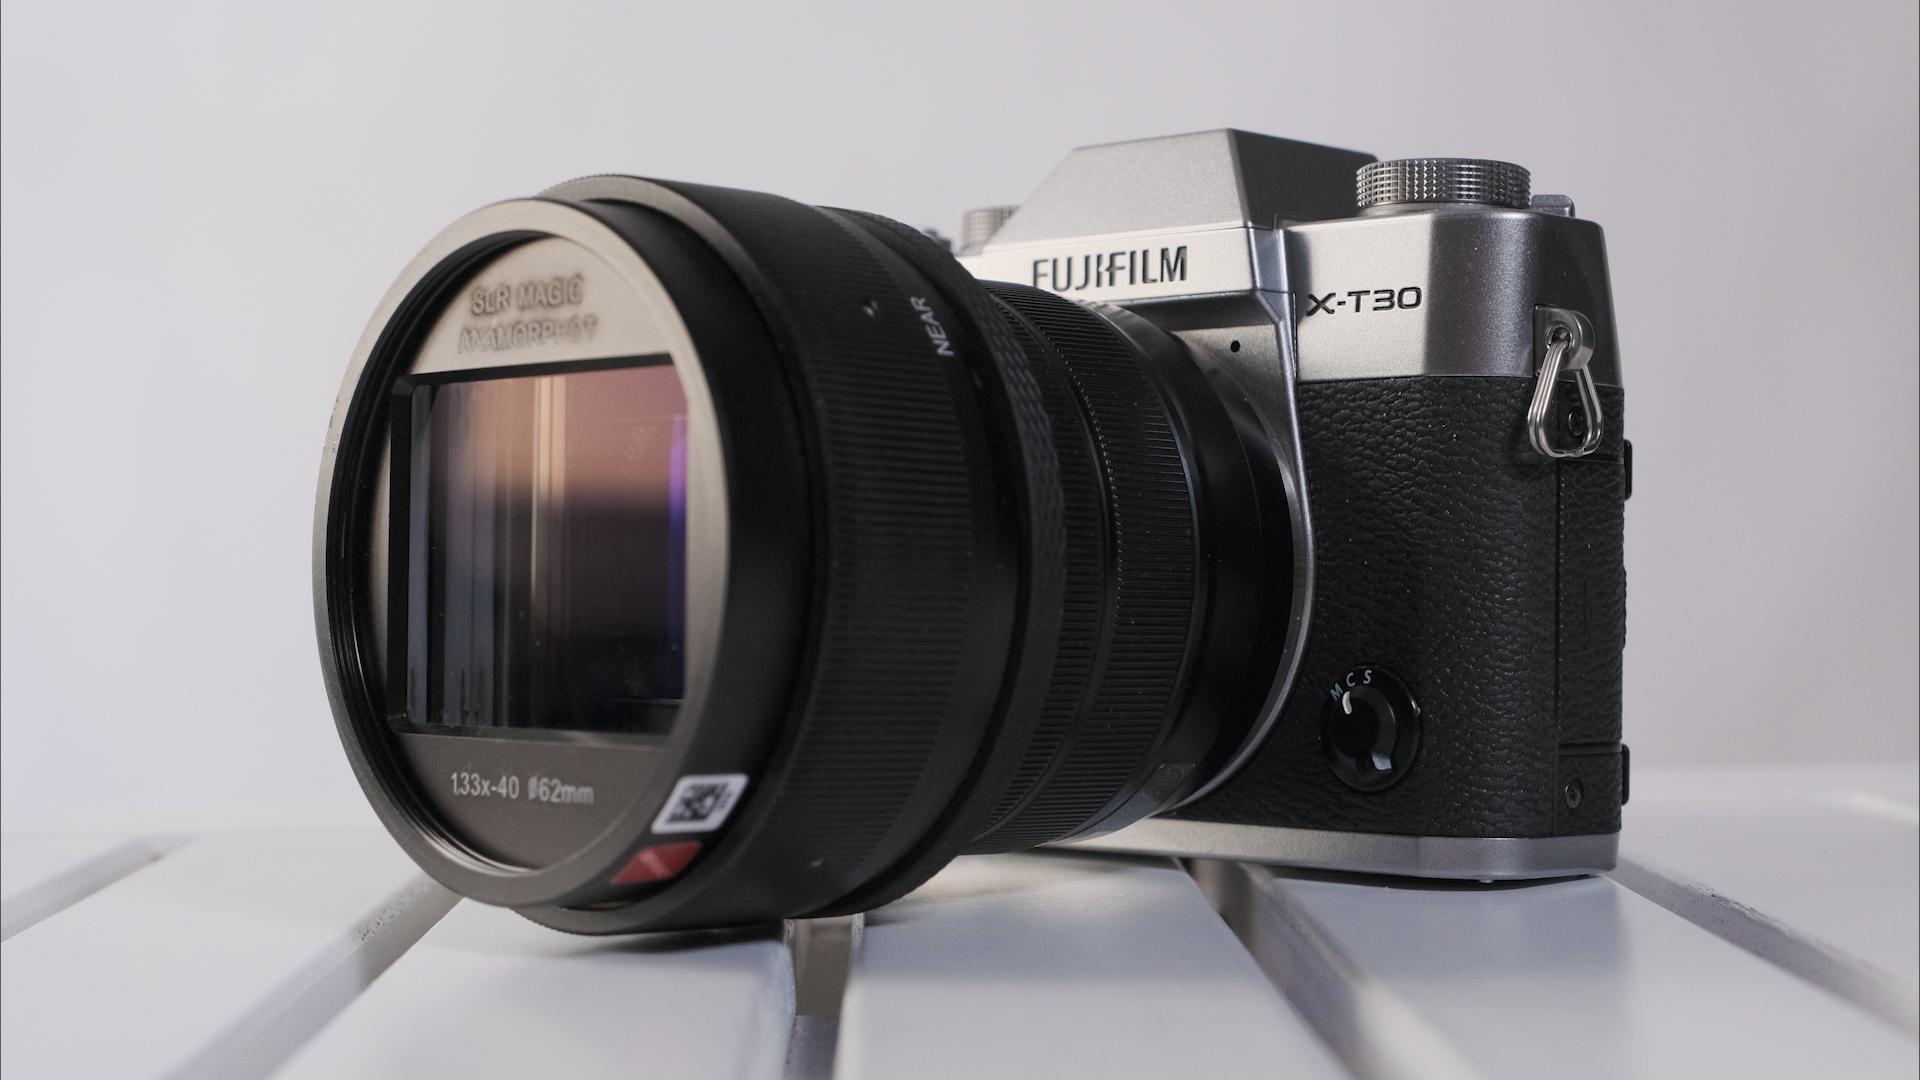 Anamorphic, Affordable: FUJIFILM X-T30 & SLR Magic